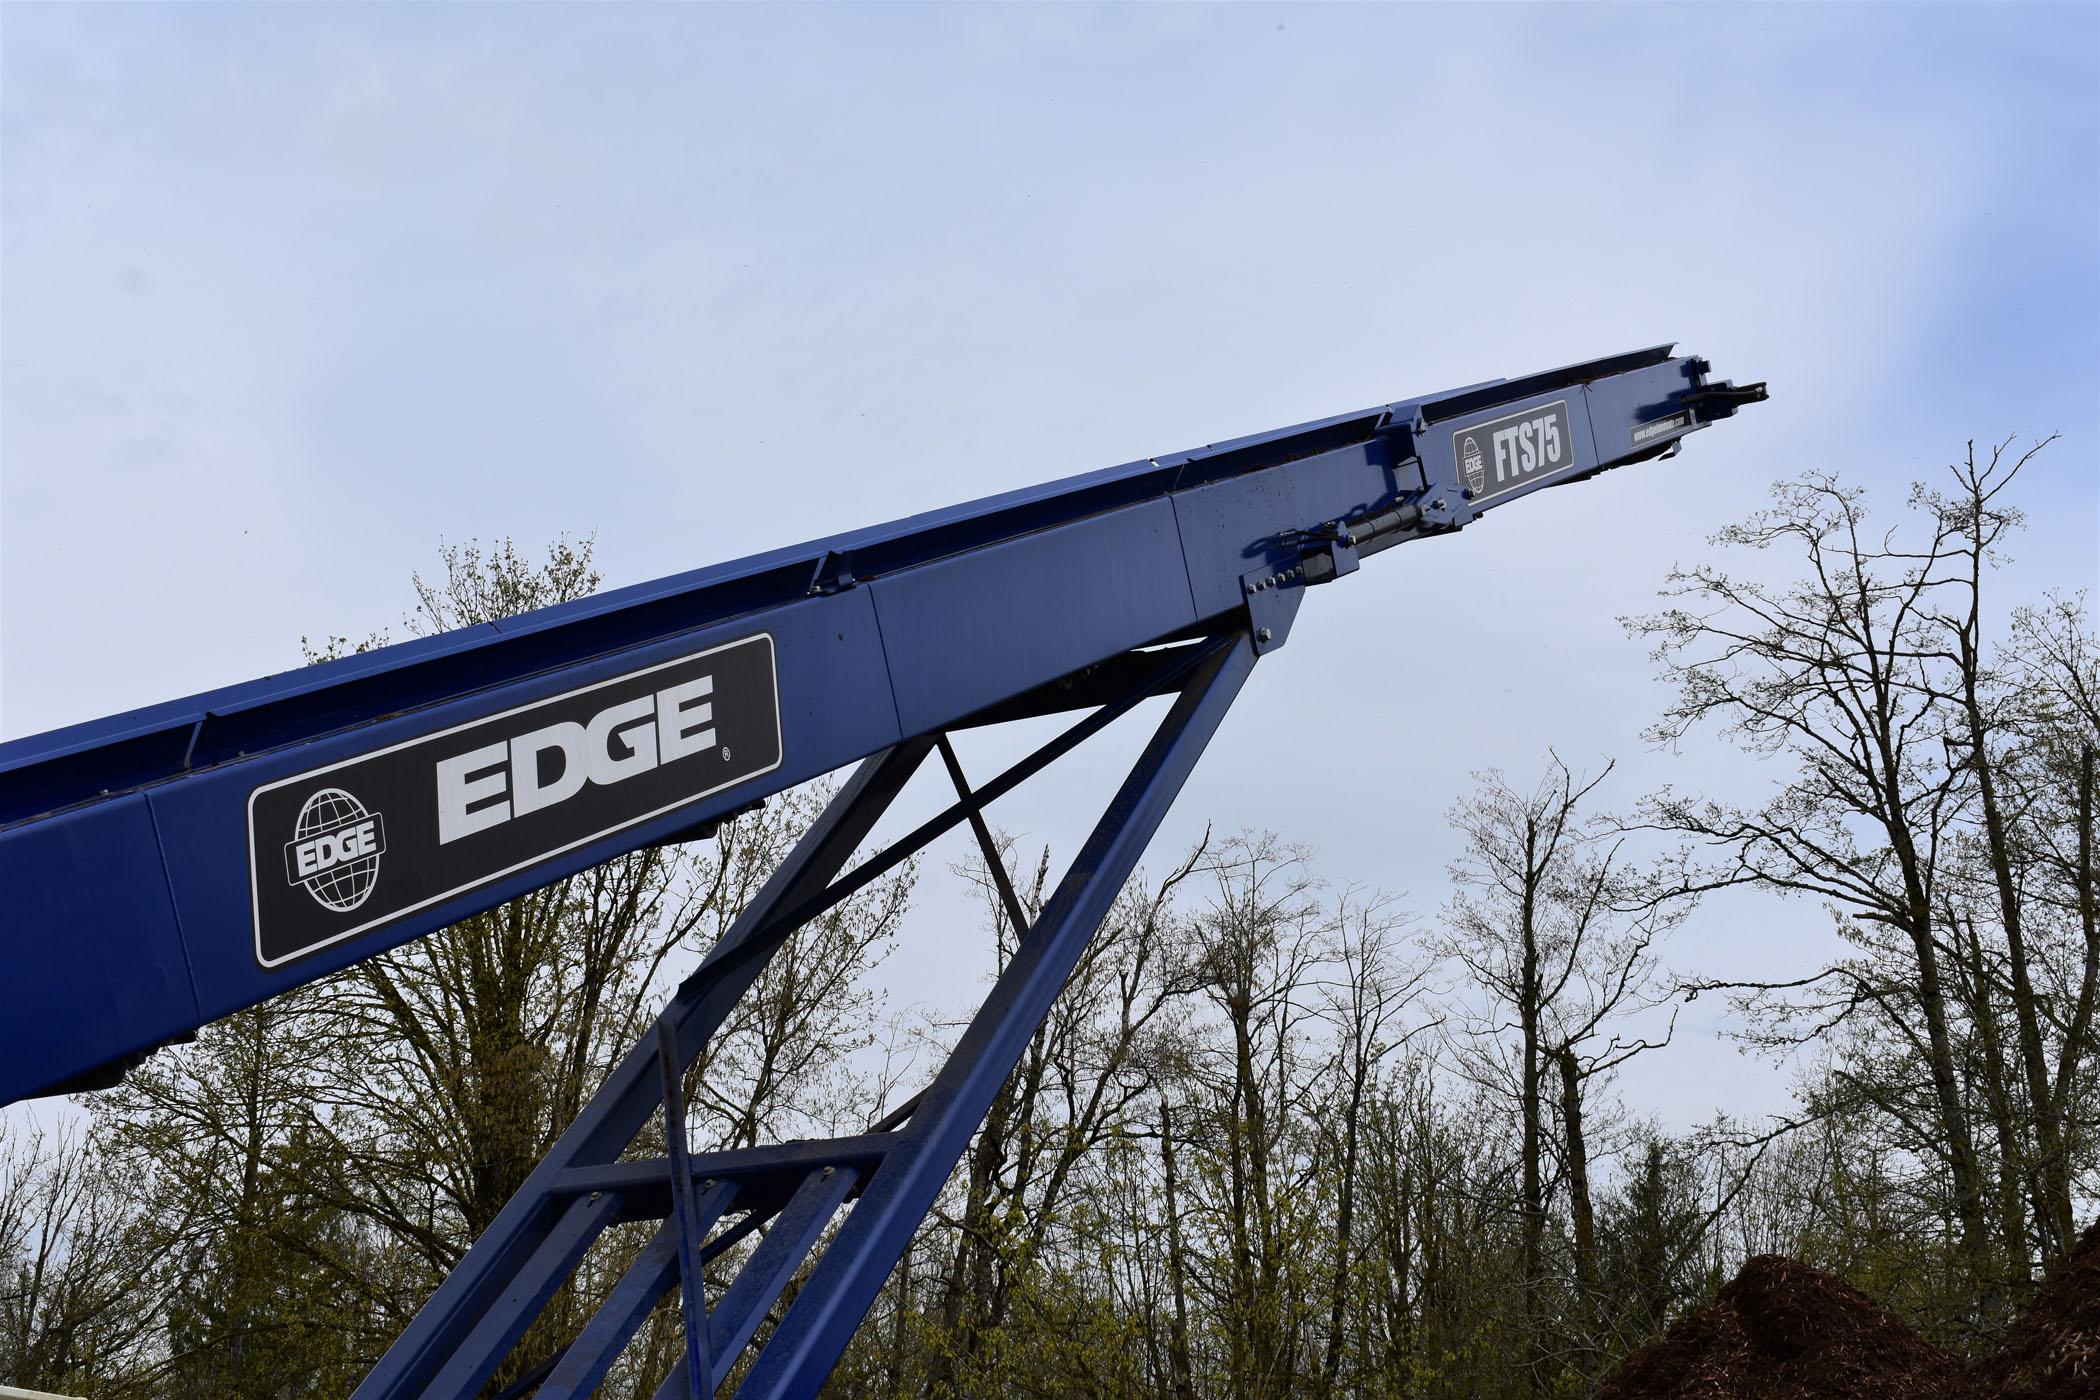 Edge Mulch Master Conveyor